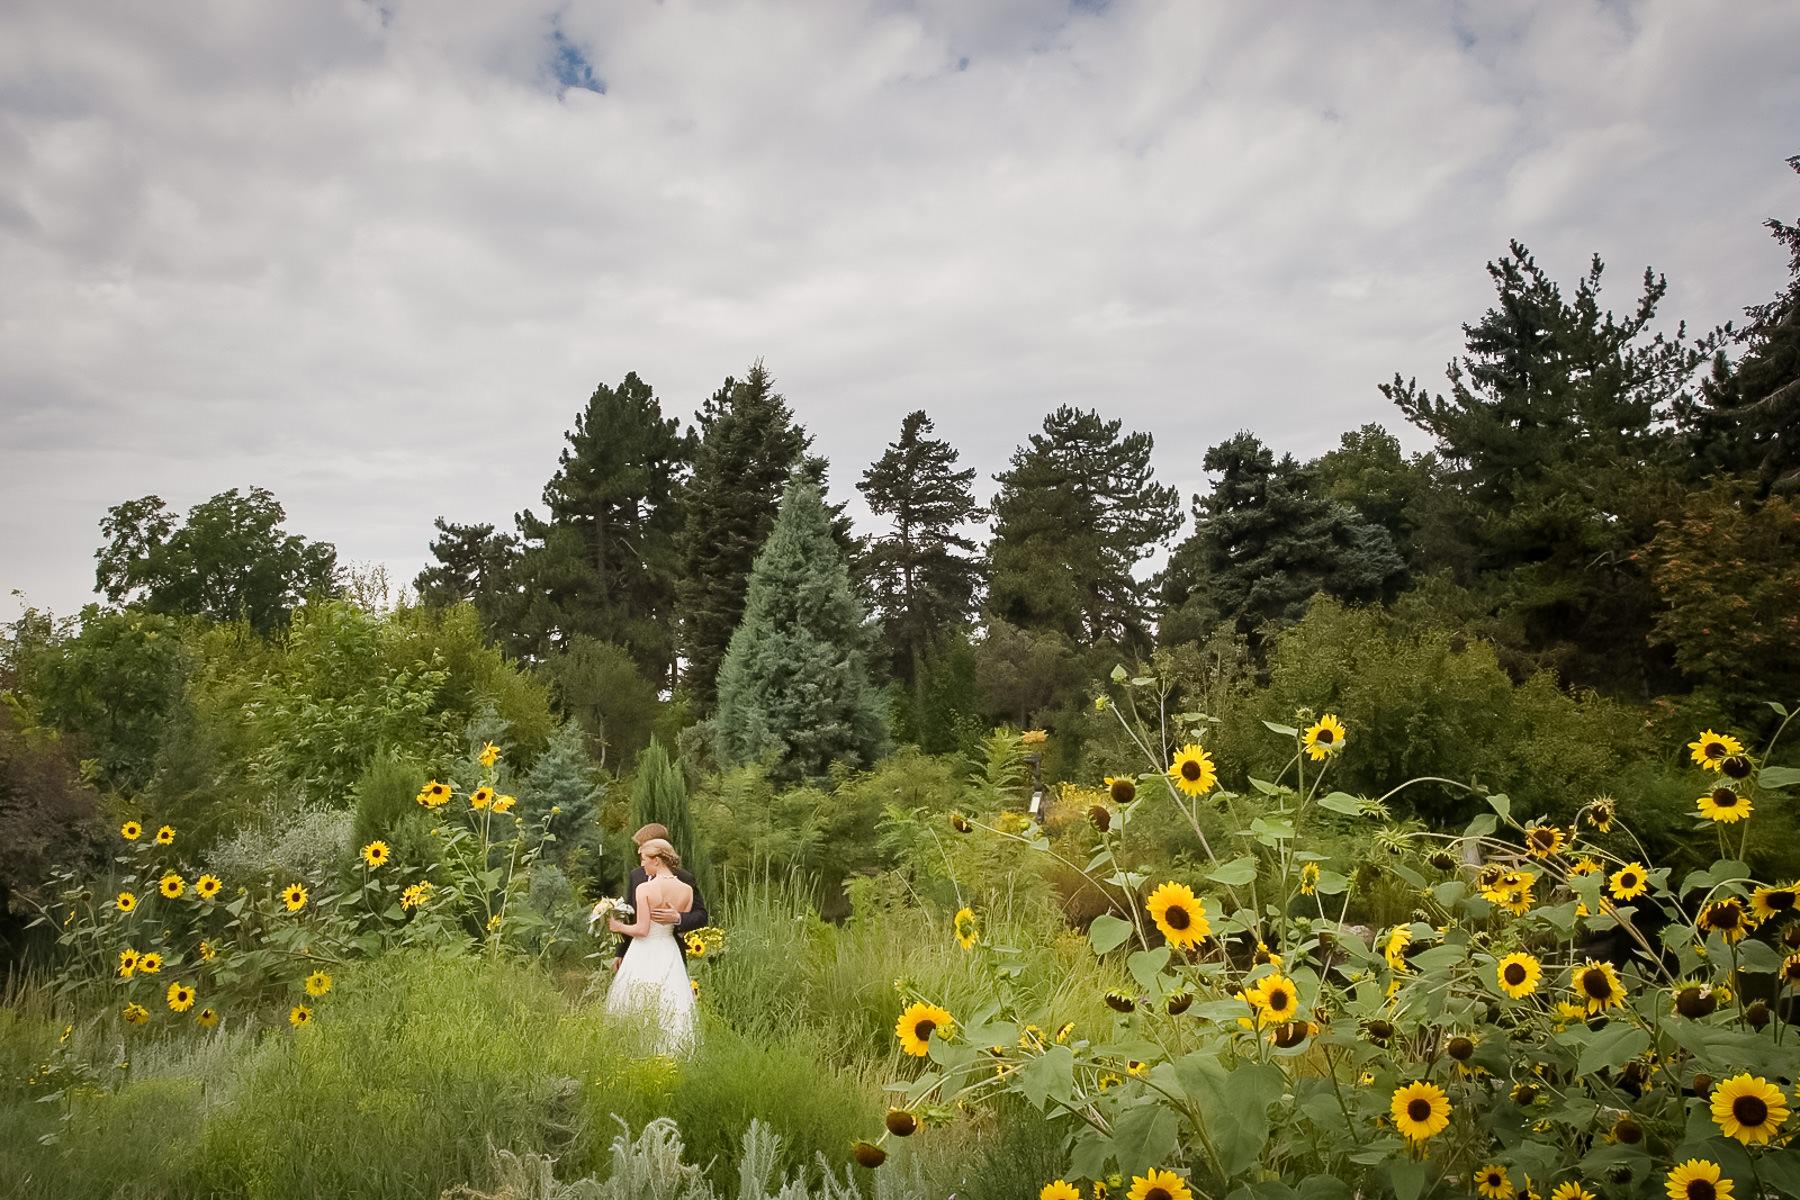 Bride and groom in Rock Alpine Garden at Denver Botanic Gardens wedding celebration.